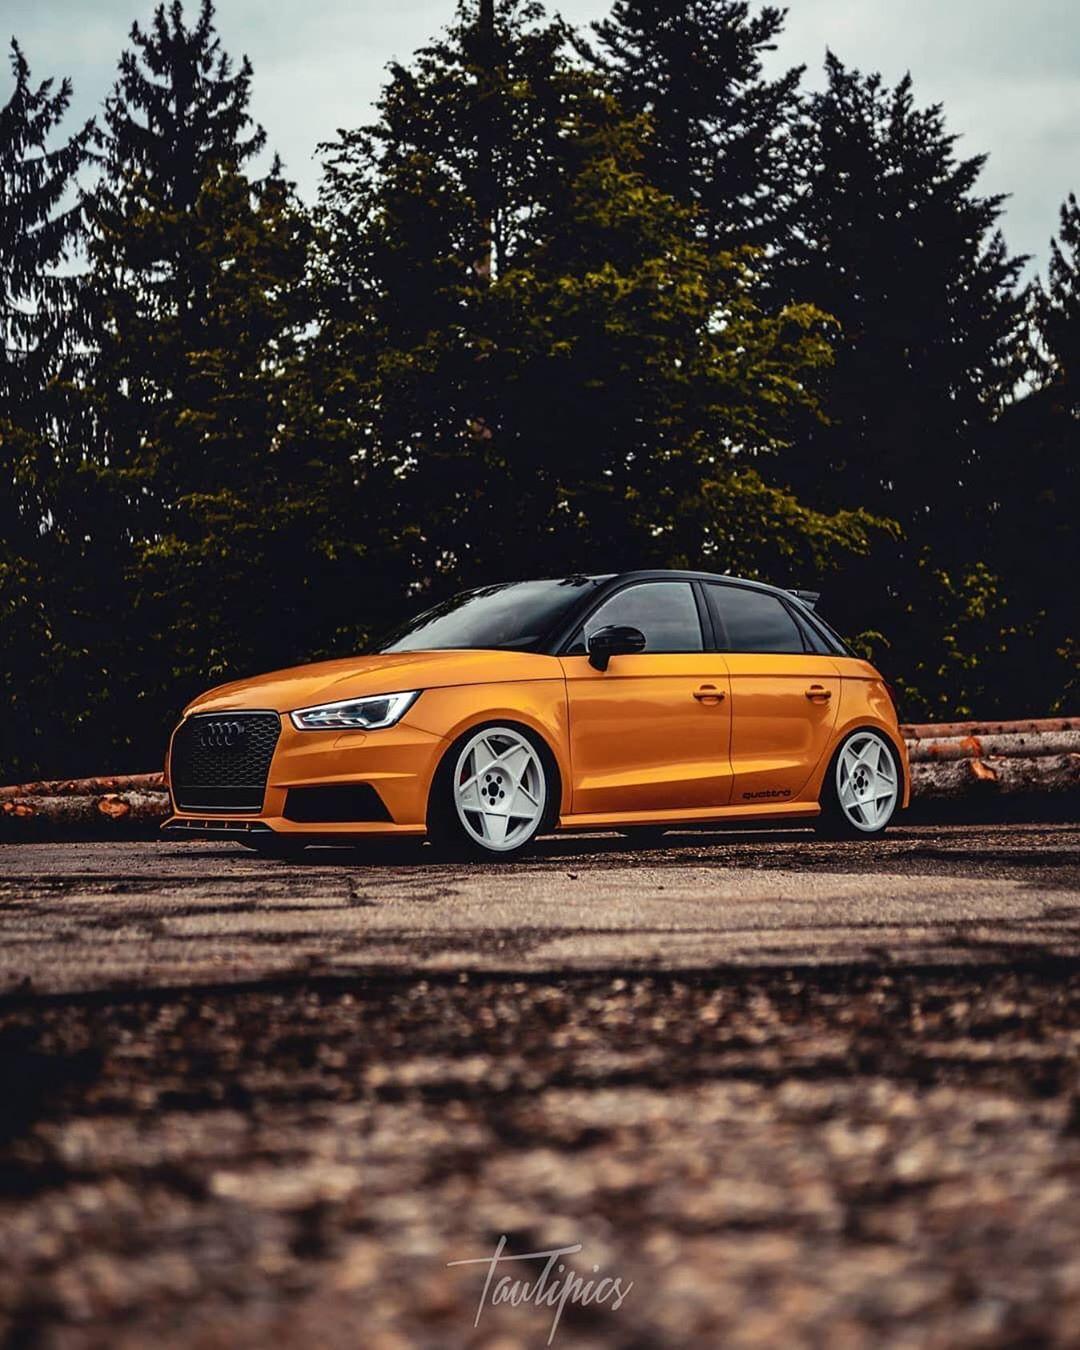 3SDM 0.05 x Audi S1Car : Photo :